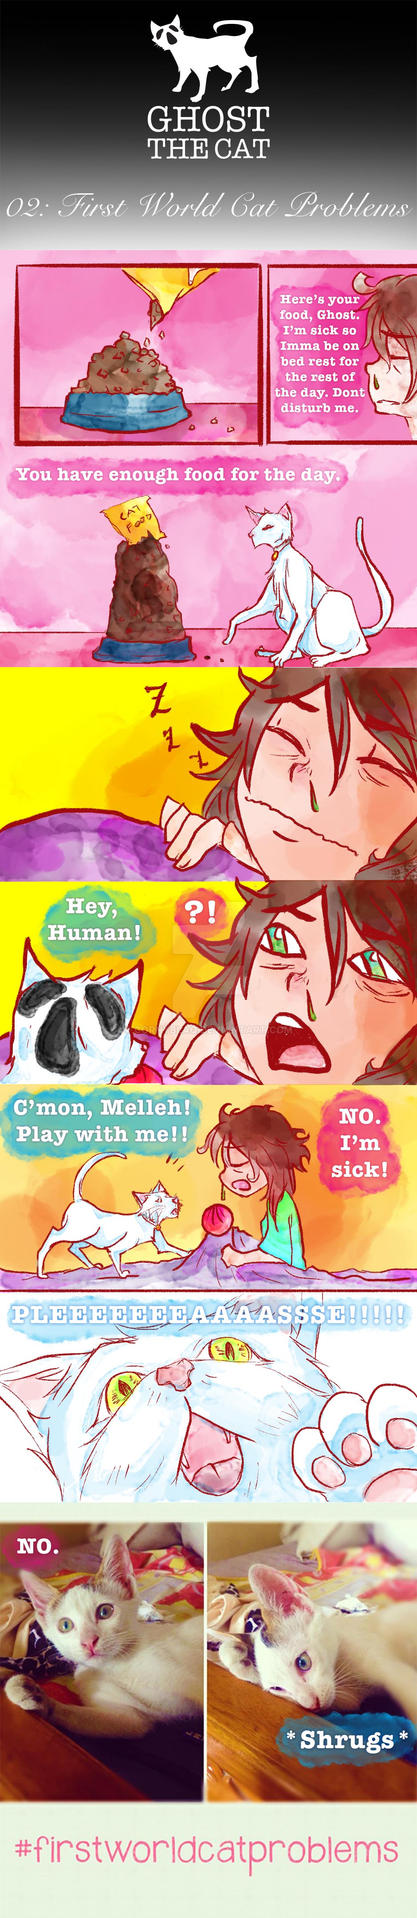 Ghost the cat comics 01 by cornyblaq